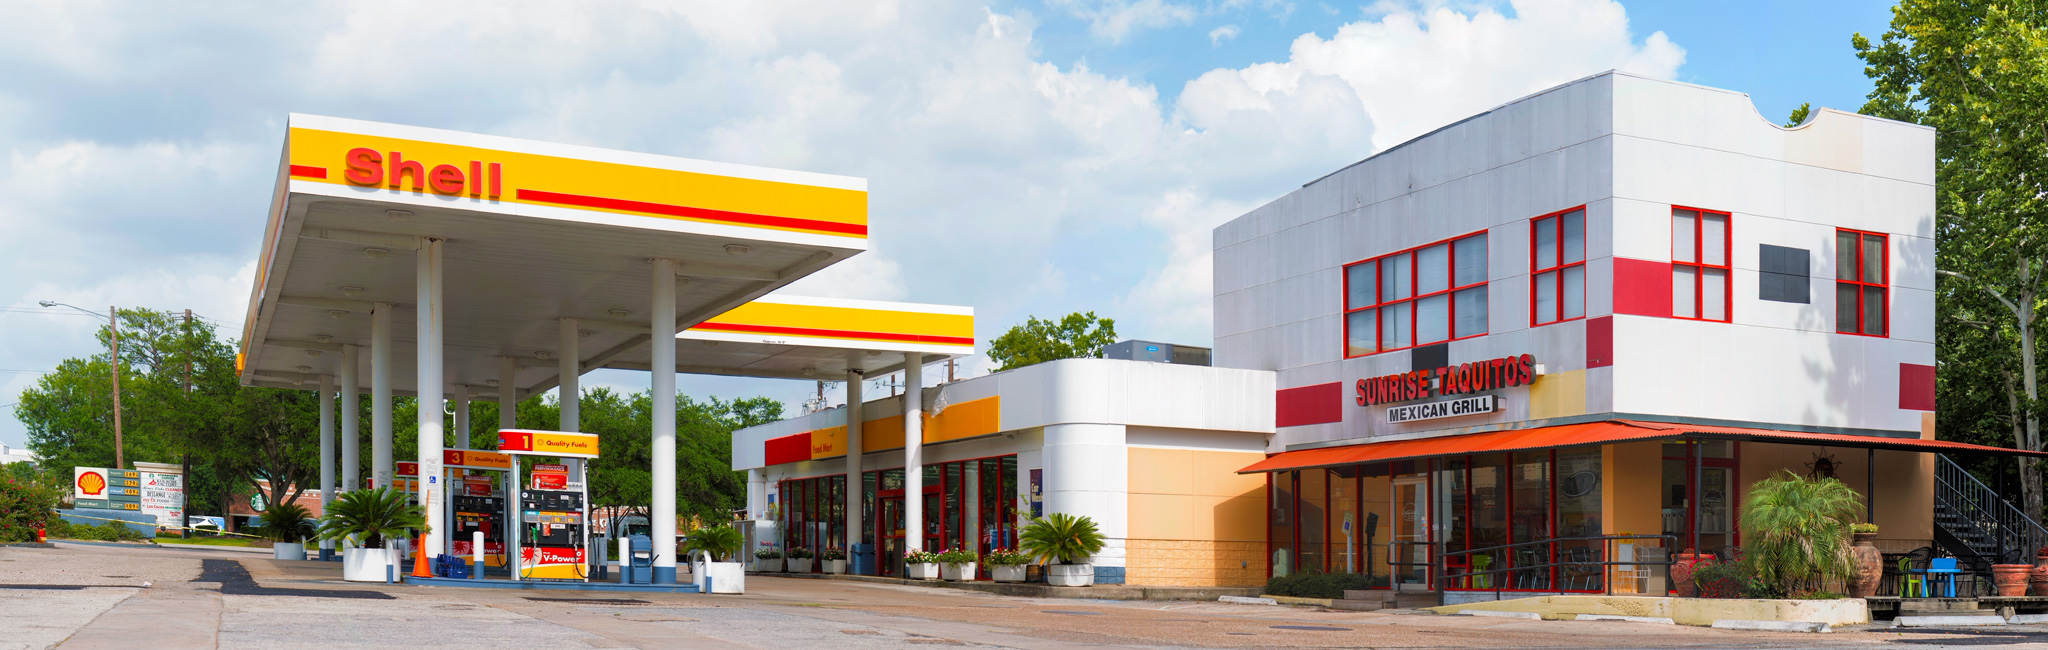 Shell-Station-pano.jpg